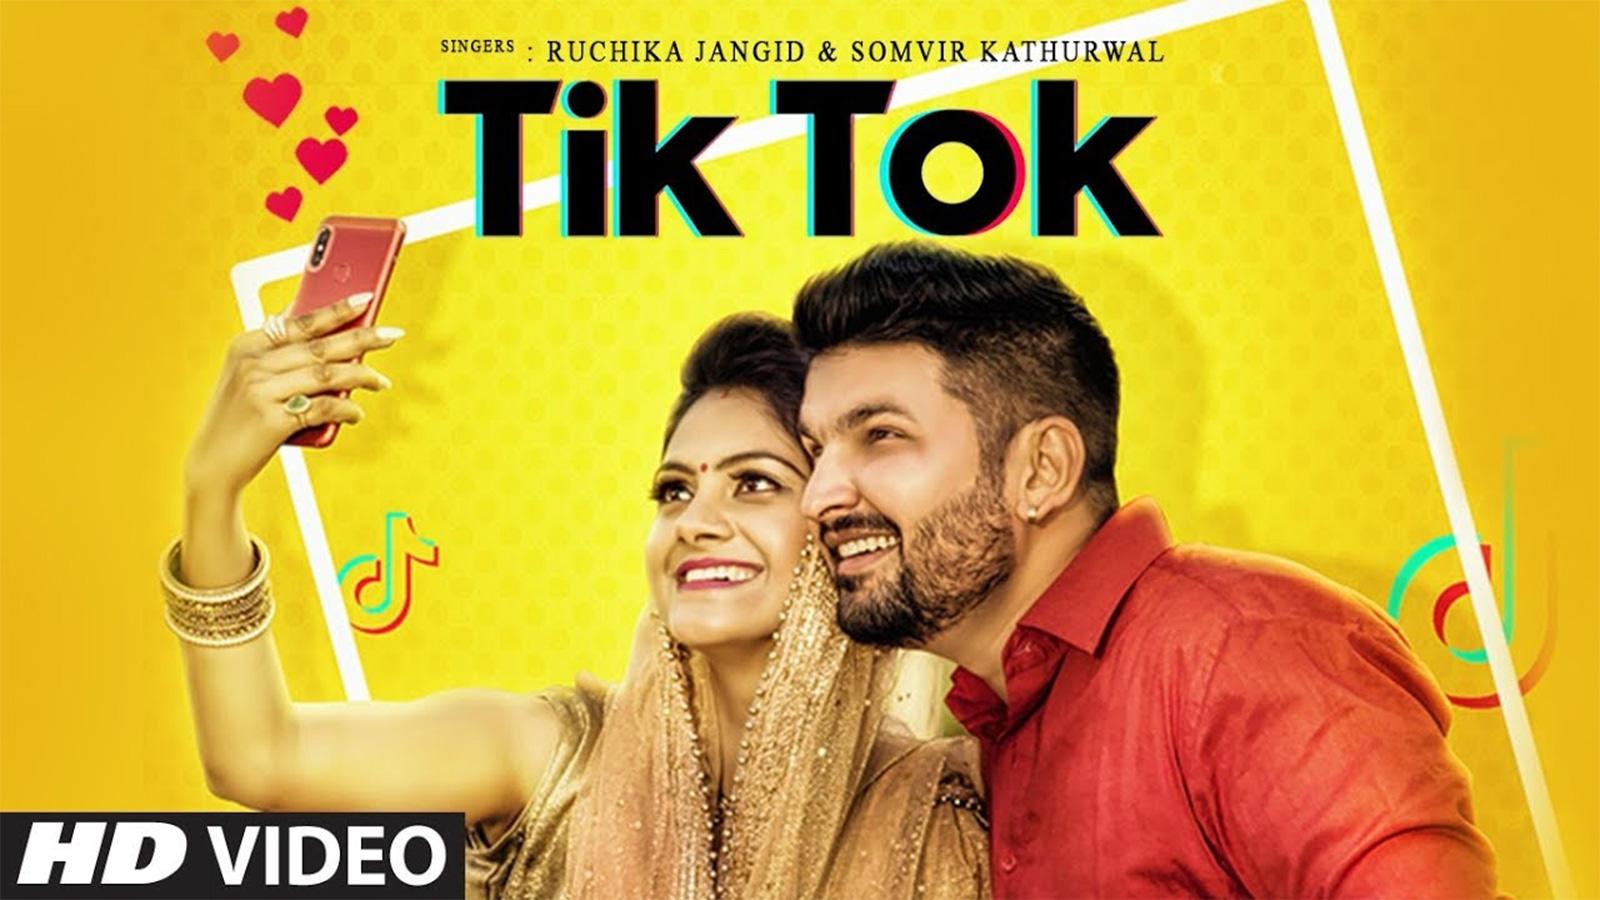 Latest Haryanvi Song 'Tik Tok' Sung By Somvir Kathurwal And Ruchika Jangid  | Haryanvi Video Songs - Times of India